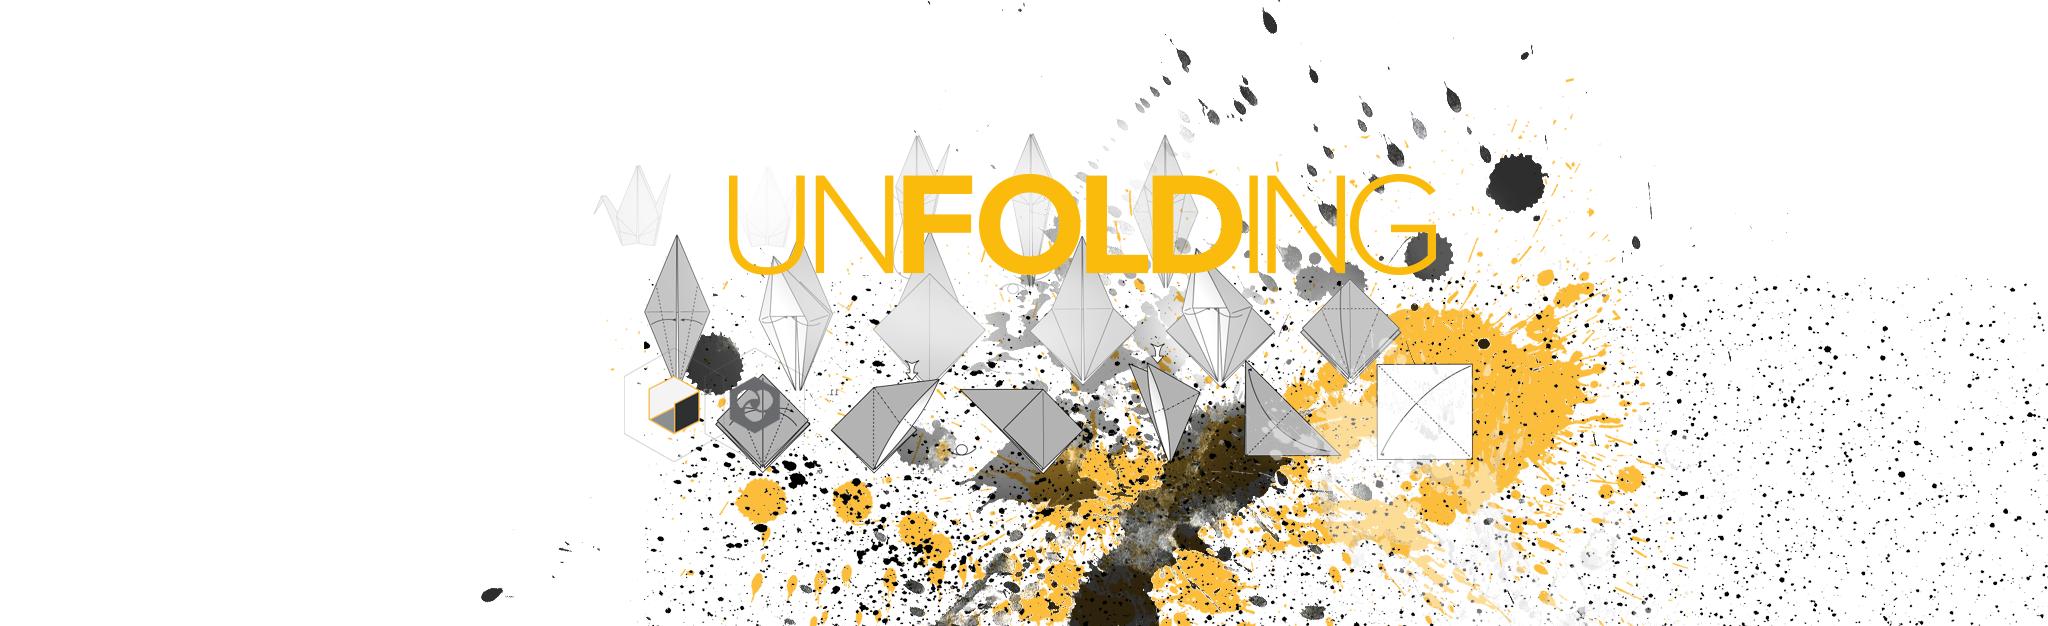 social_layout72_unfolding-origami_HUGE.png